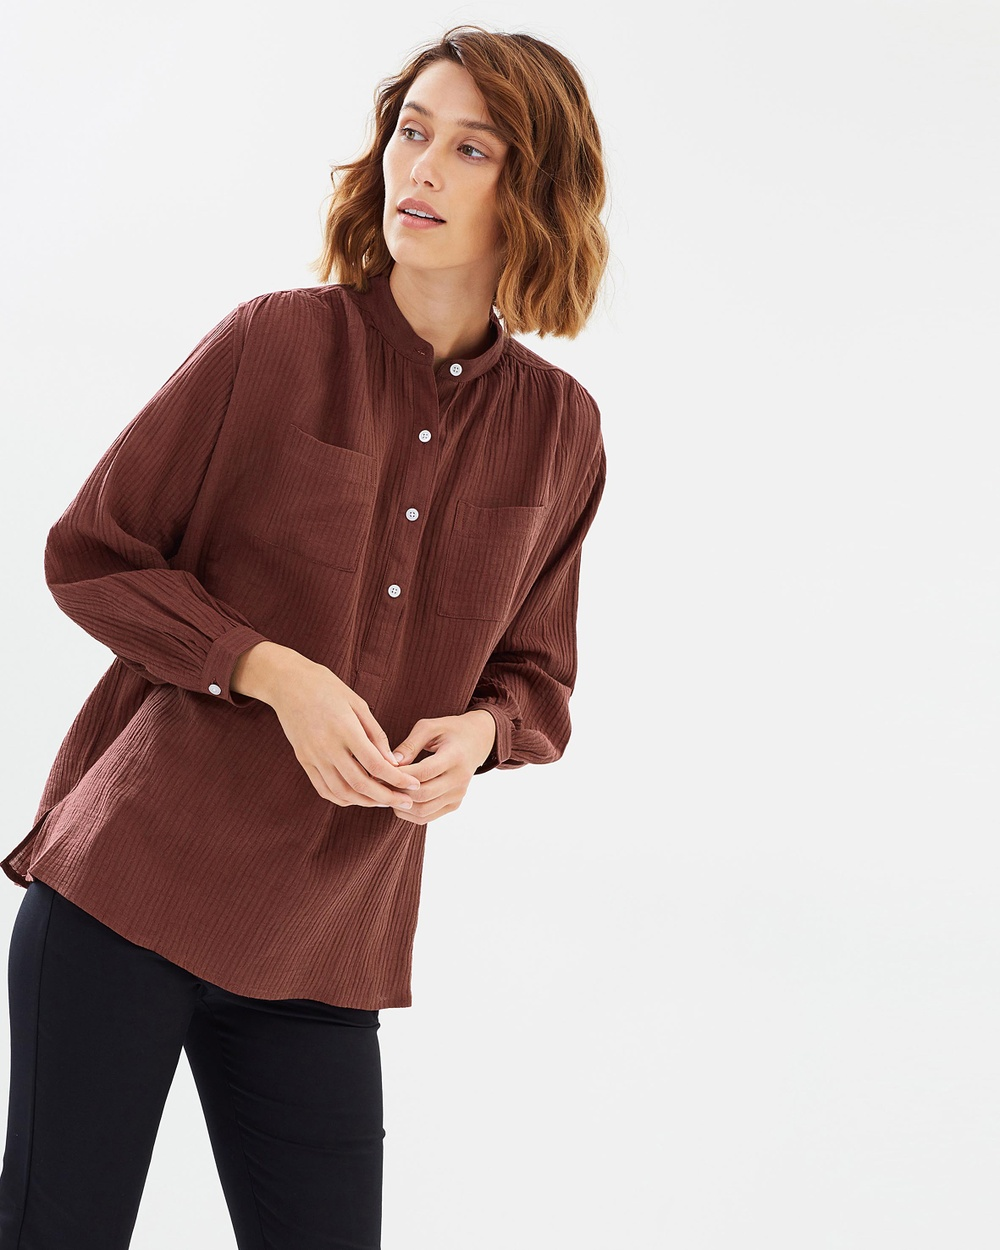 Weathered Nina Relaxed Shirt Tops Wine Nina Relaxed Shirt